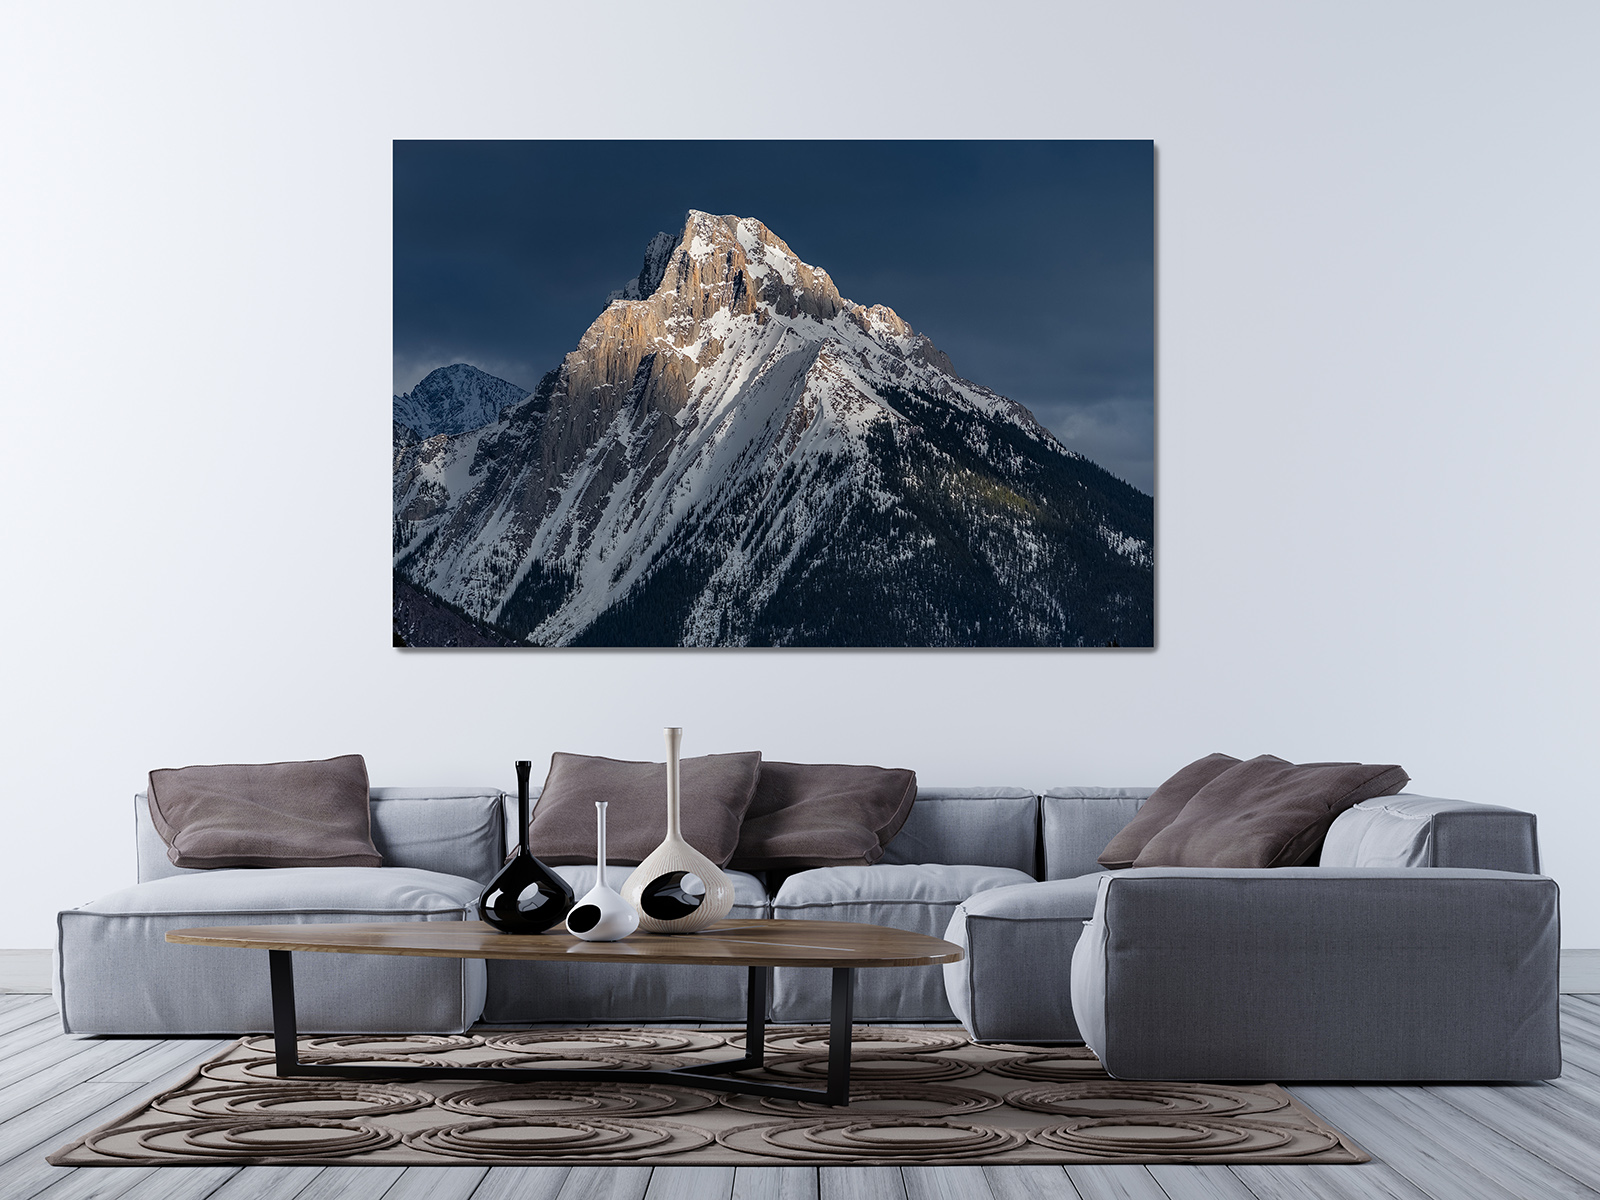 poster, modern, blank, wall, living room, corner sofa, mock up, 3D rendering, 3D illustration, sofa, contemporary, floor, home...